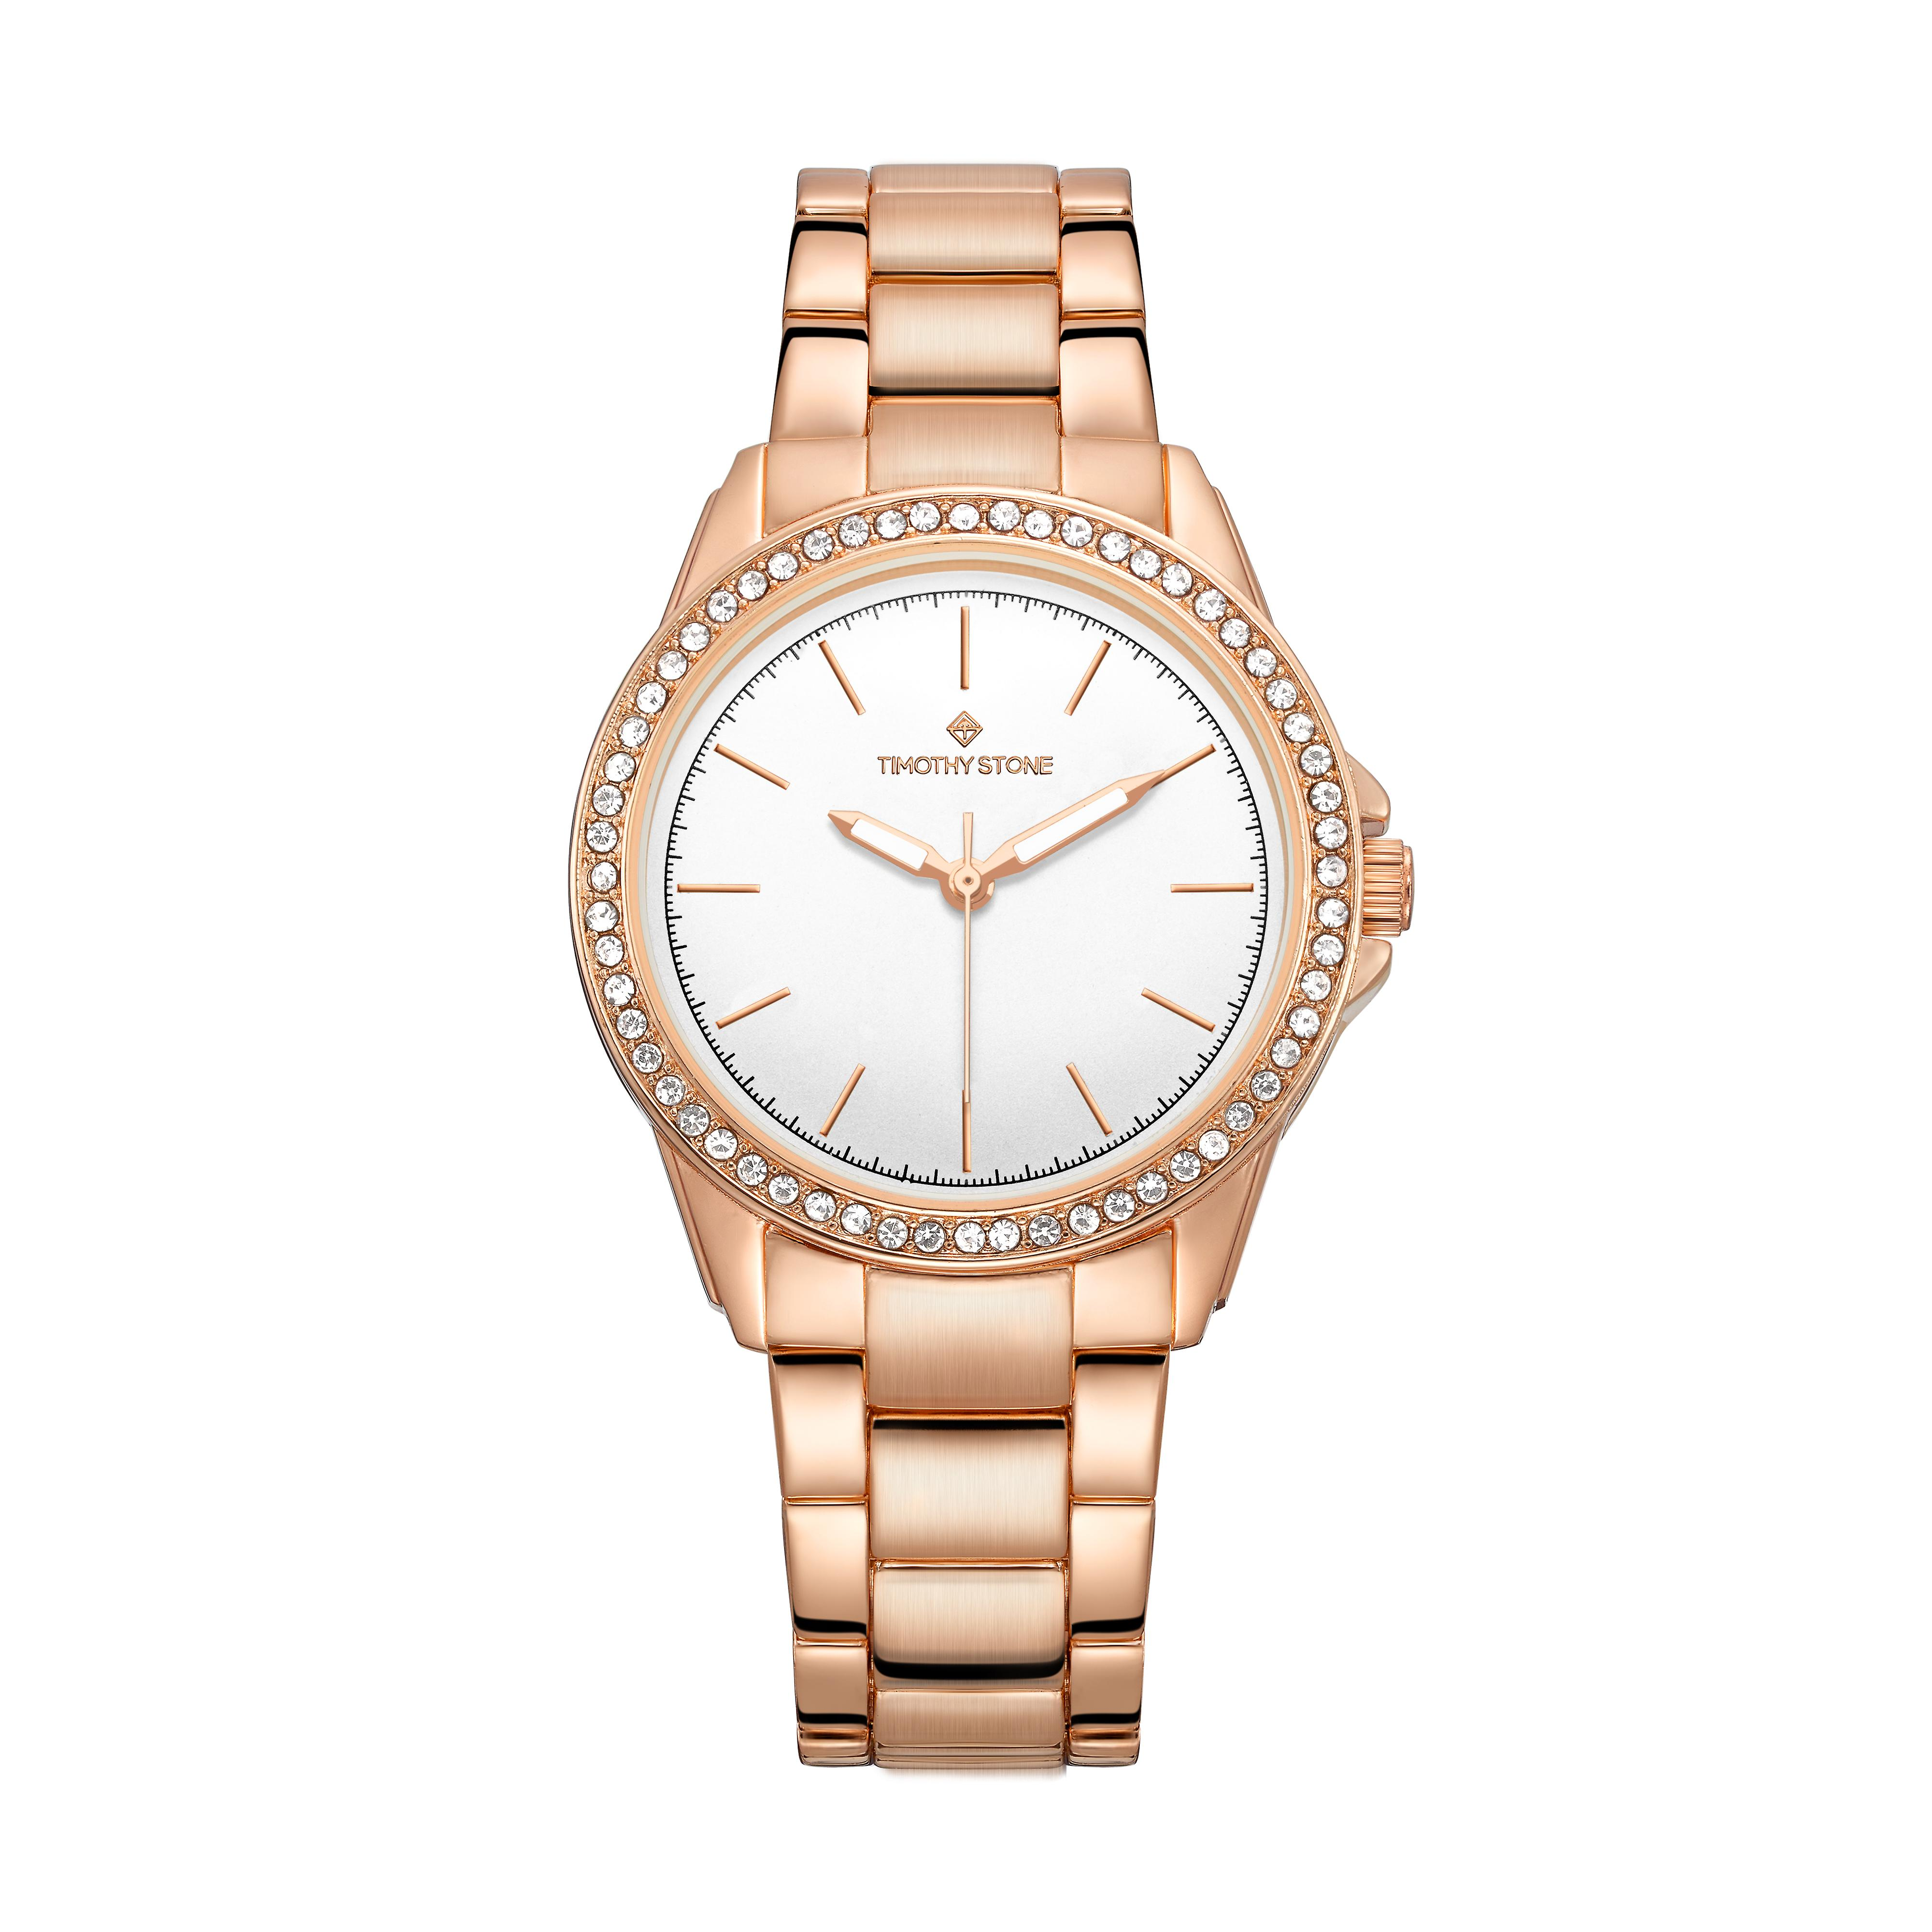 Timothy Stone Women's KATY Rose Gold-Tone Watch